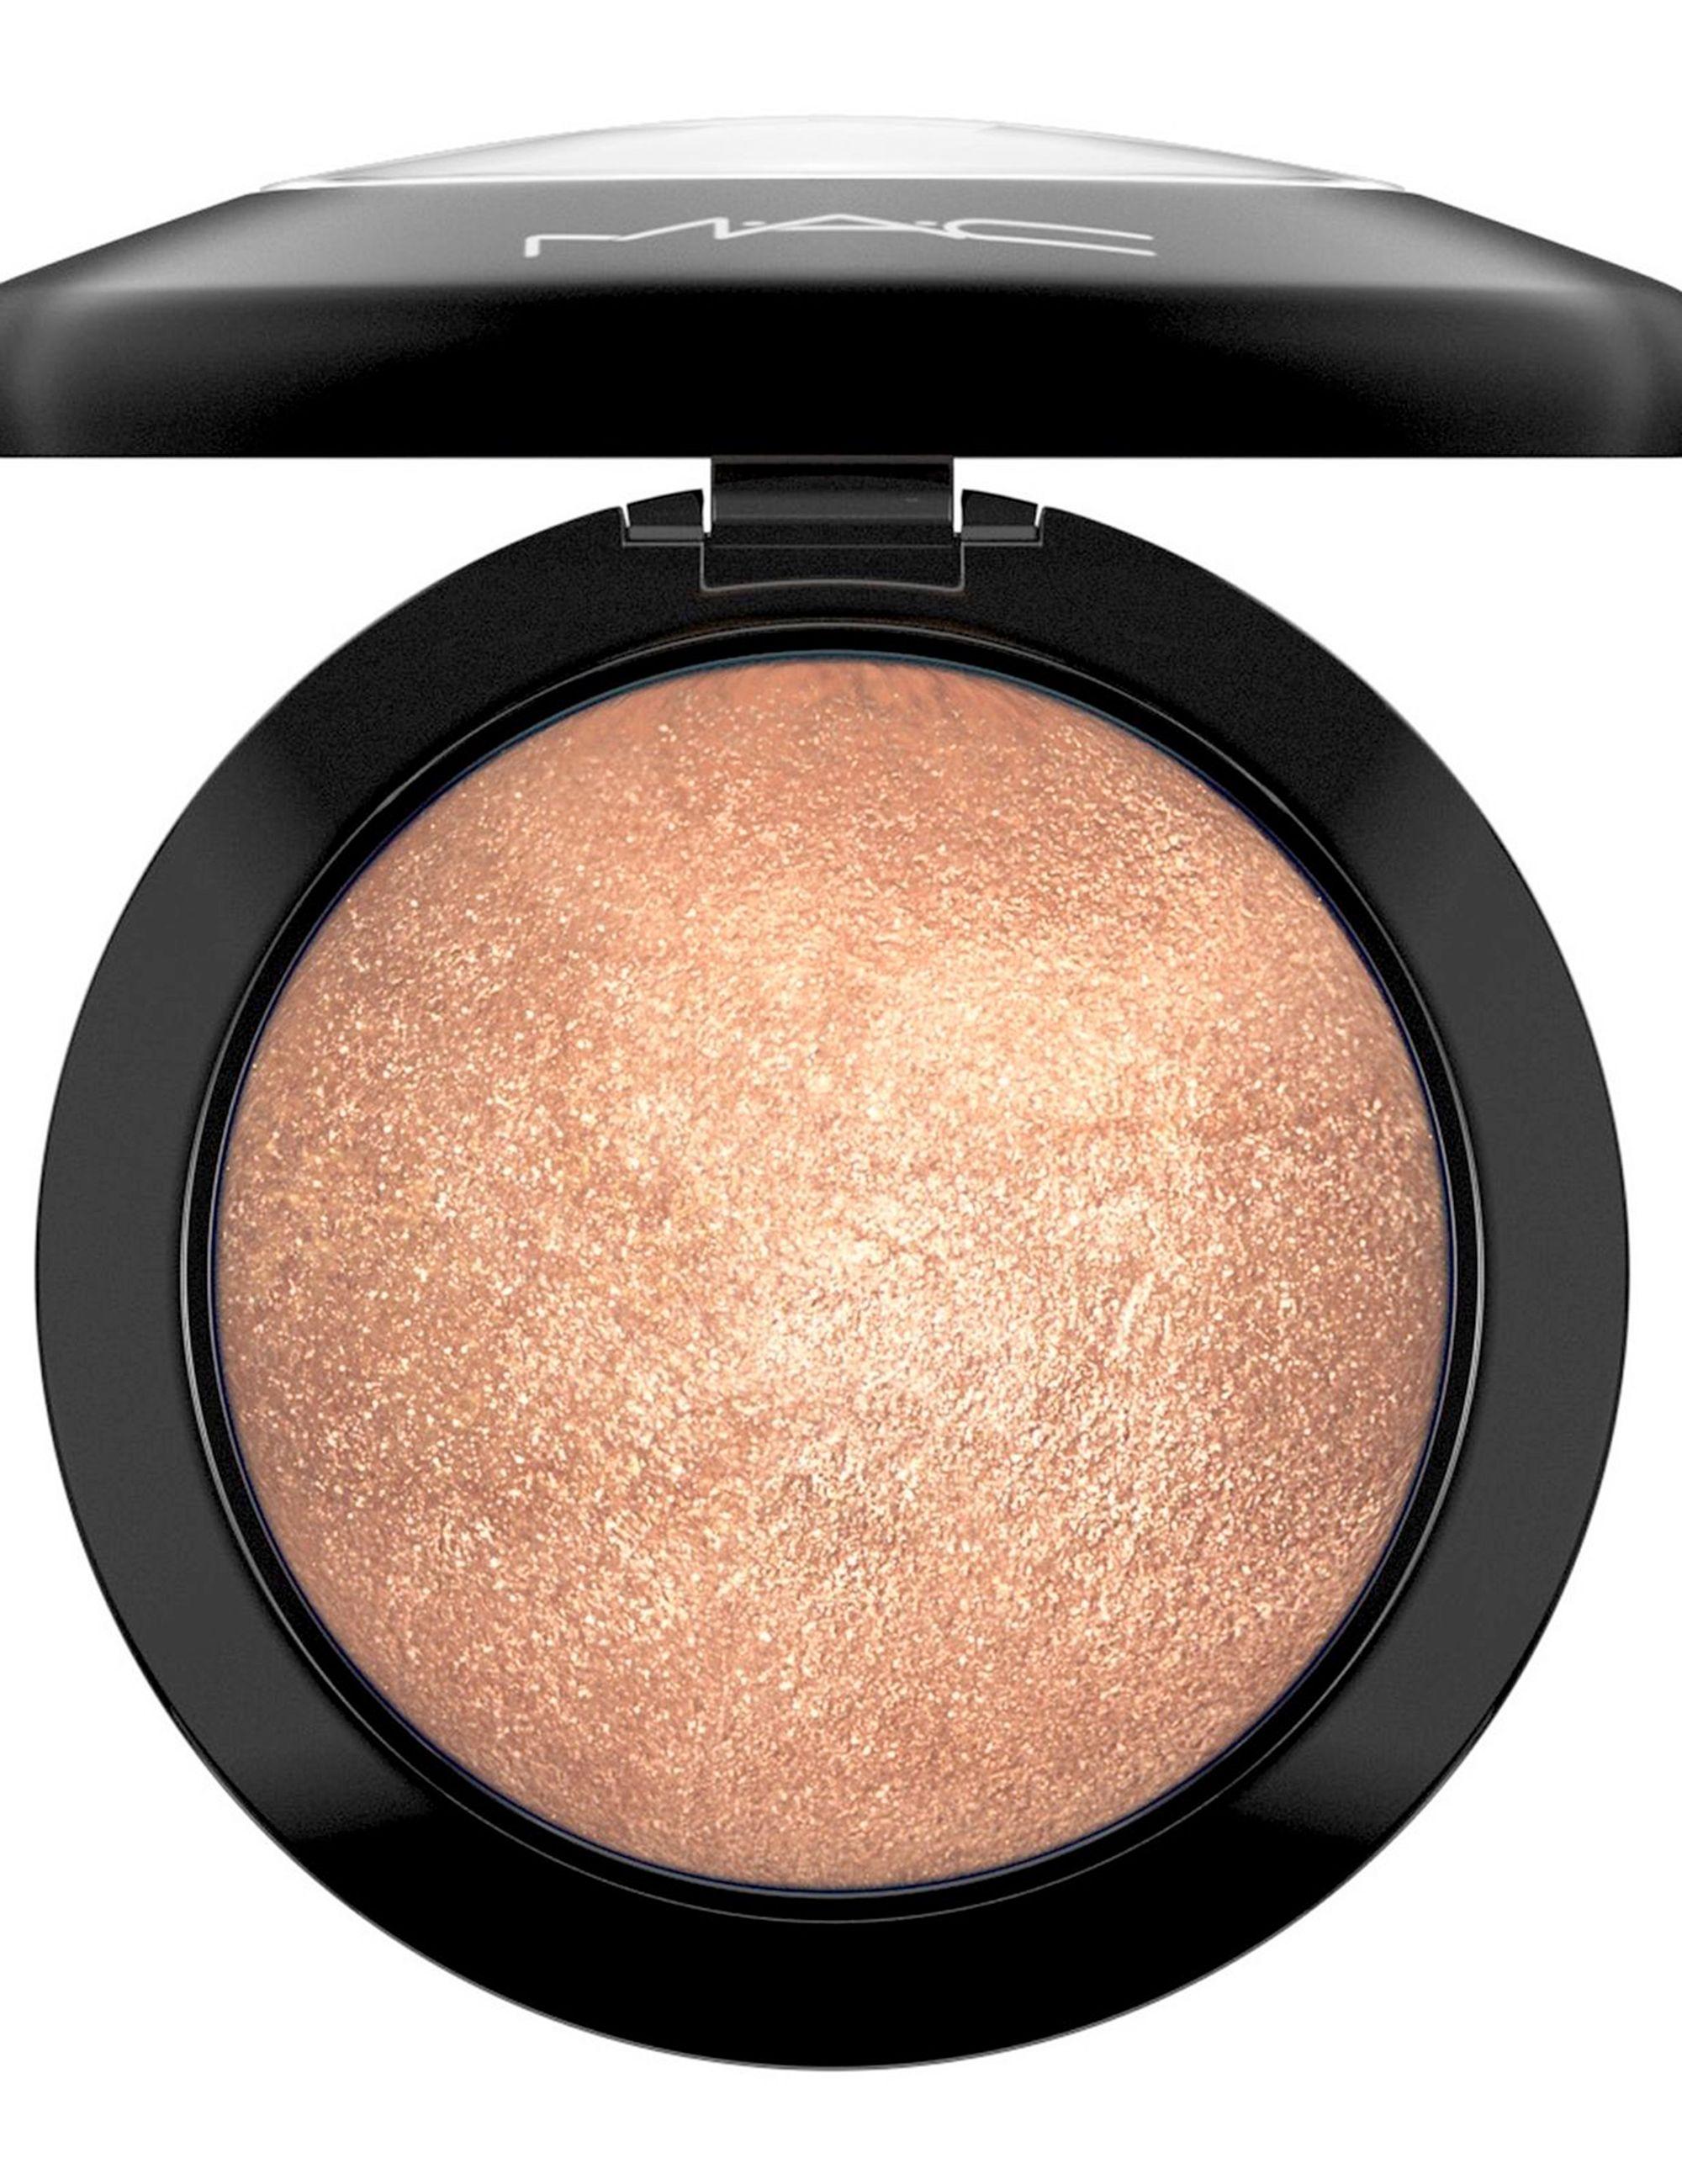 iQ Natural Mineral Makeup Starter Kit – Powder Brush, Silk Primer, Mineral Foundation, Setting Veil, Bisque Concealer, Bronzer + Eye Shadow for Flawless Bare Looking Skin, Full Set (Fair).